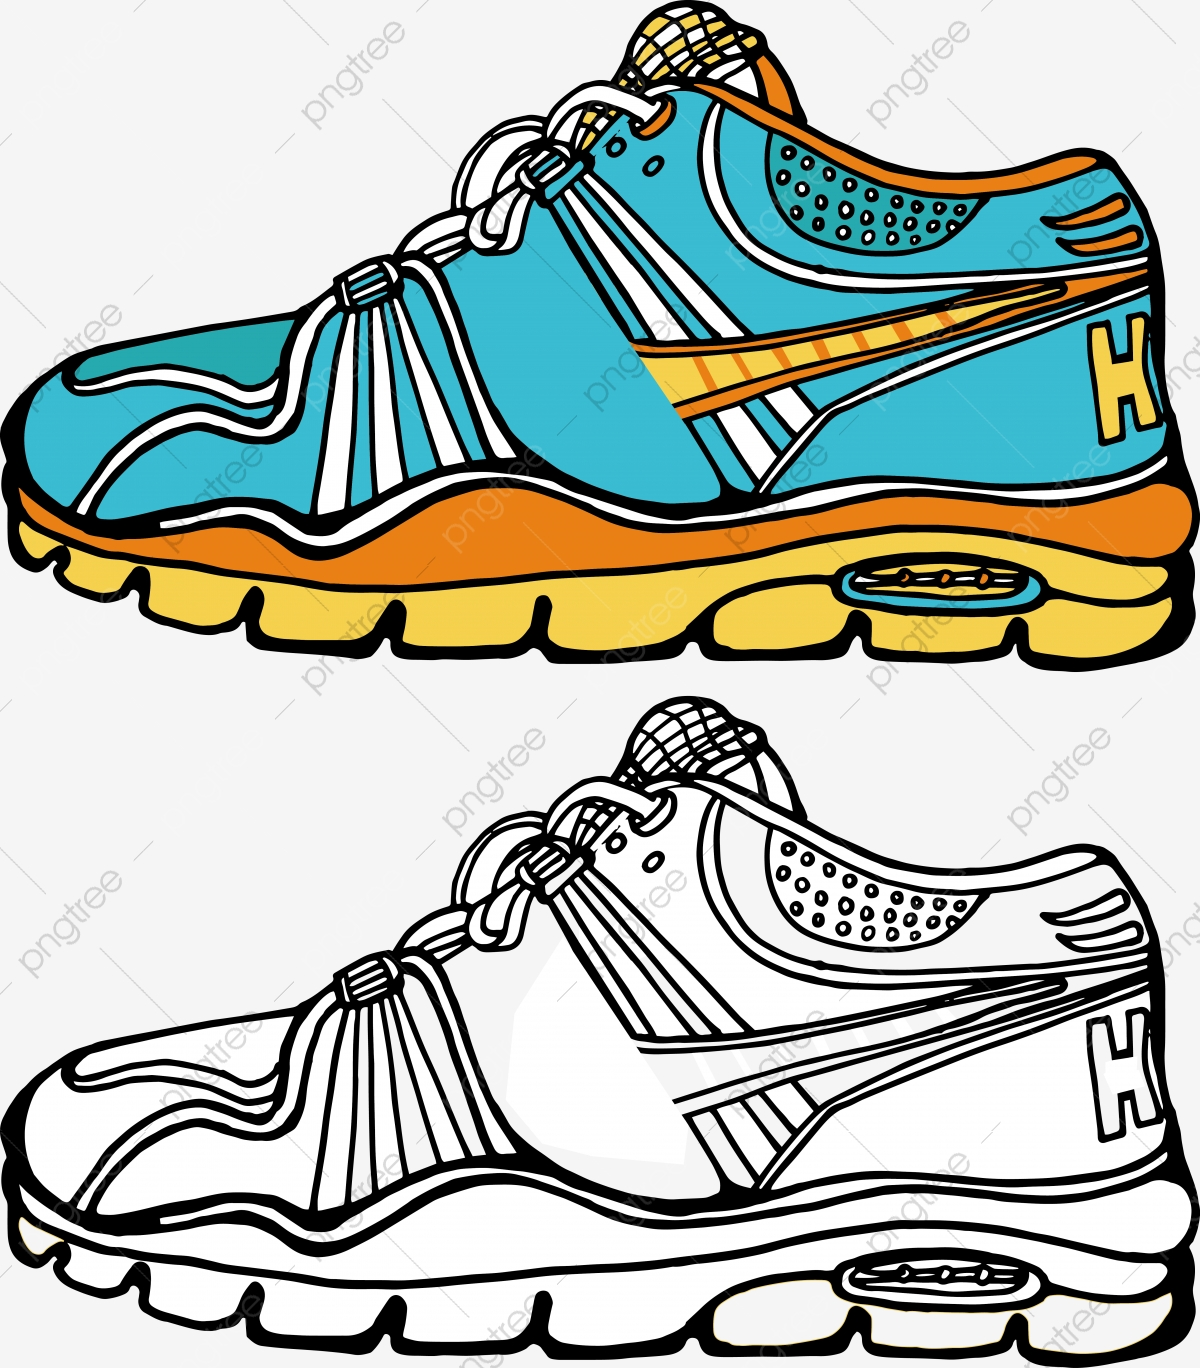 Cartoon Sneaker IllustrationSneakersNikeVector Nike Sneaker Nike nXNwPZkO80